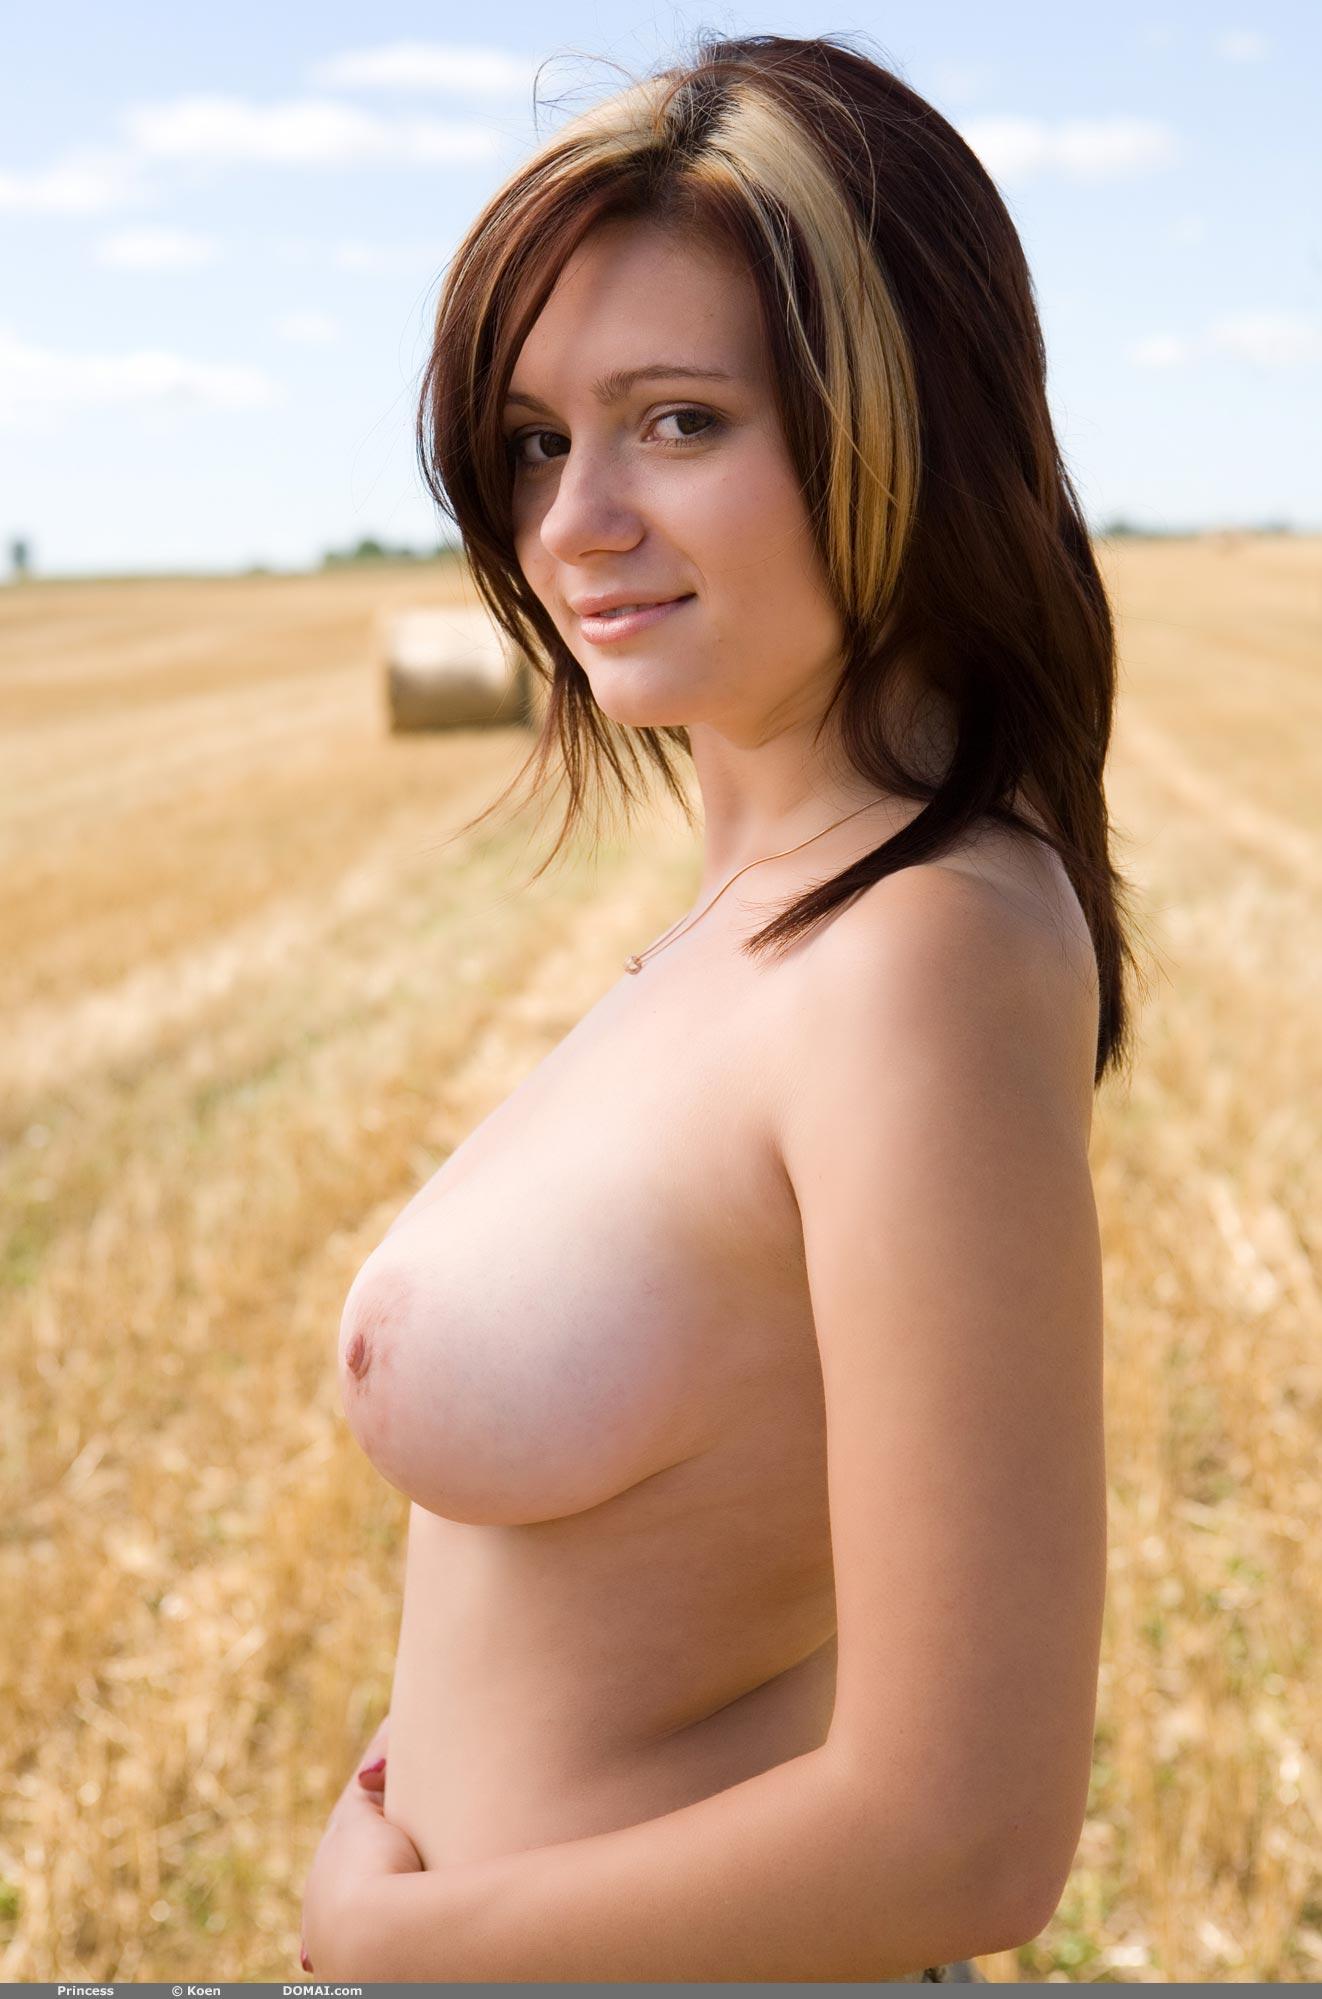 imgspice nude